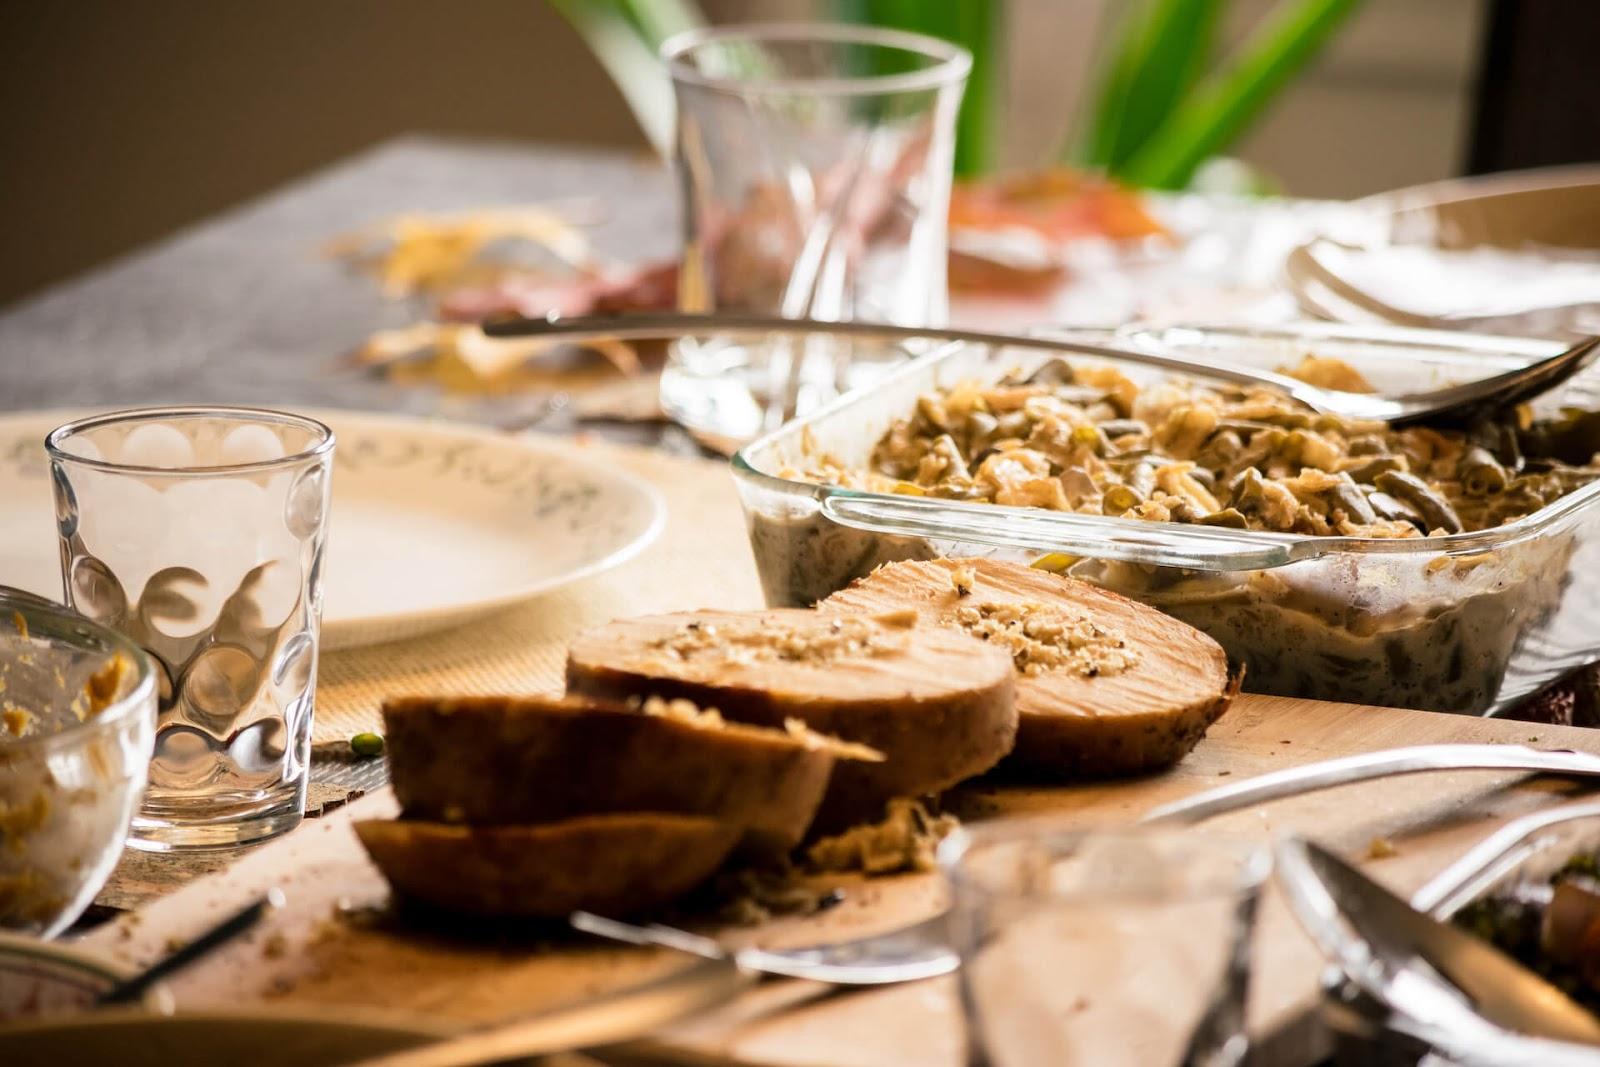 Vegan Thanksgiving meal items